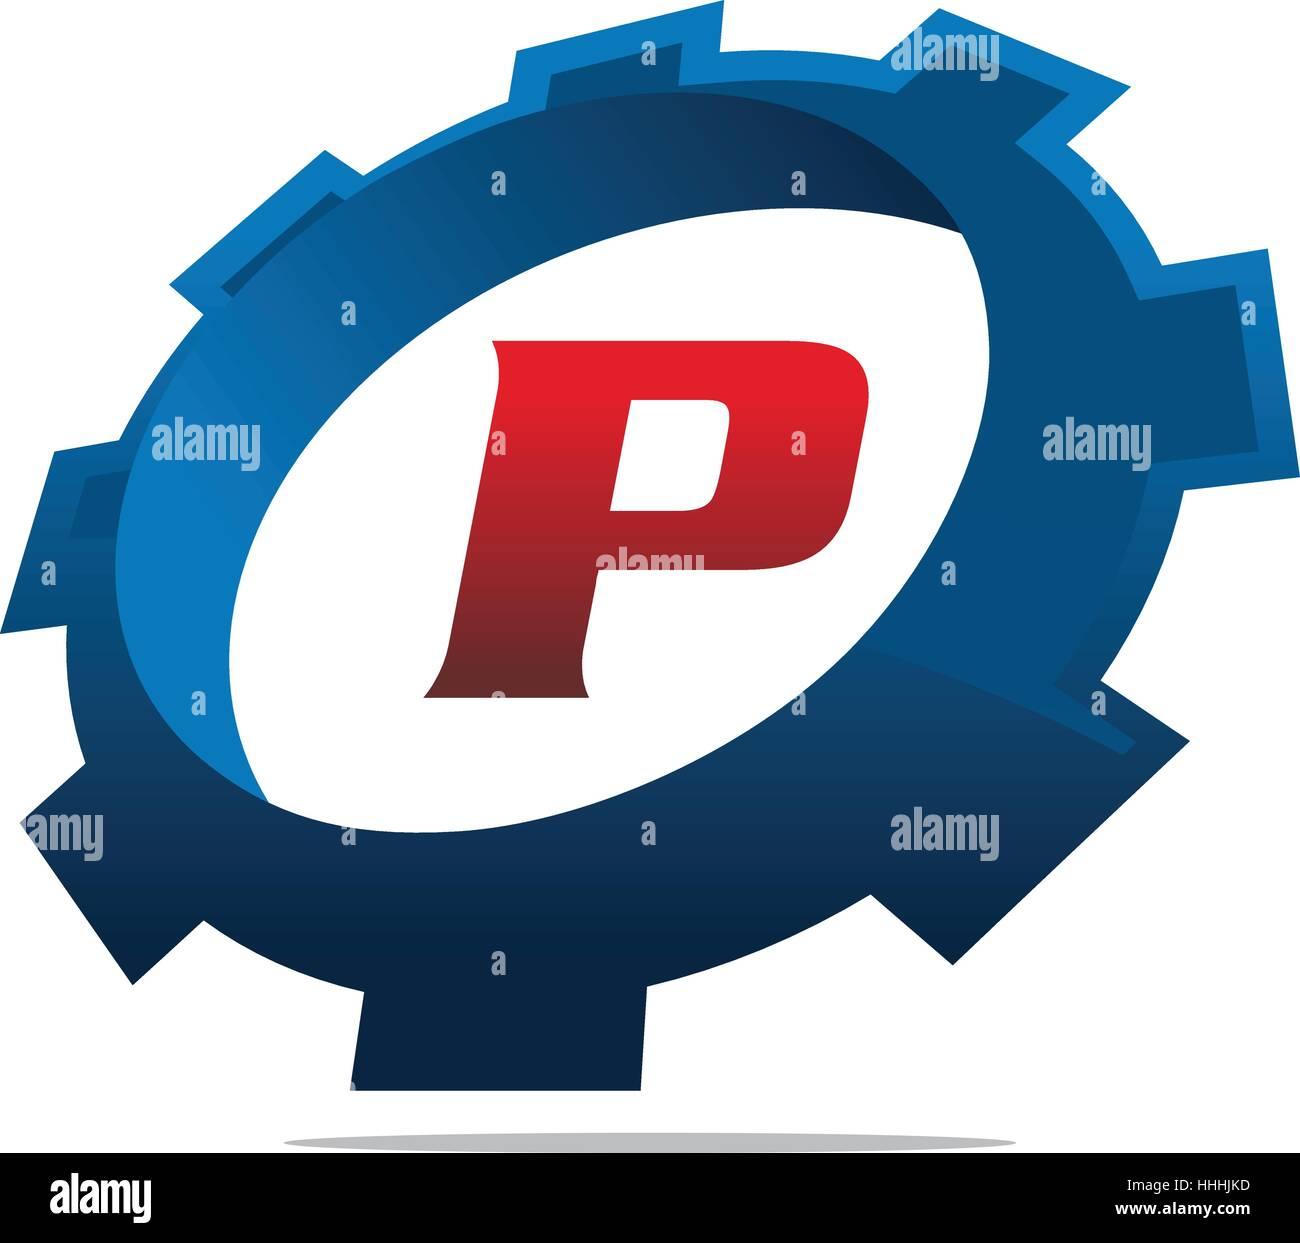 gear logo letter p stock vector art illustration vector image rh alamy com hhs logo image hhh login